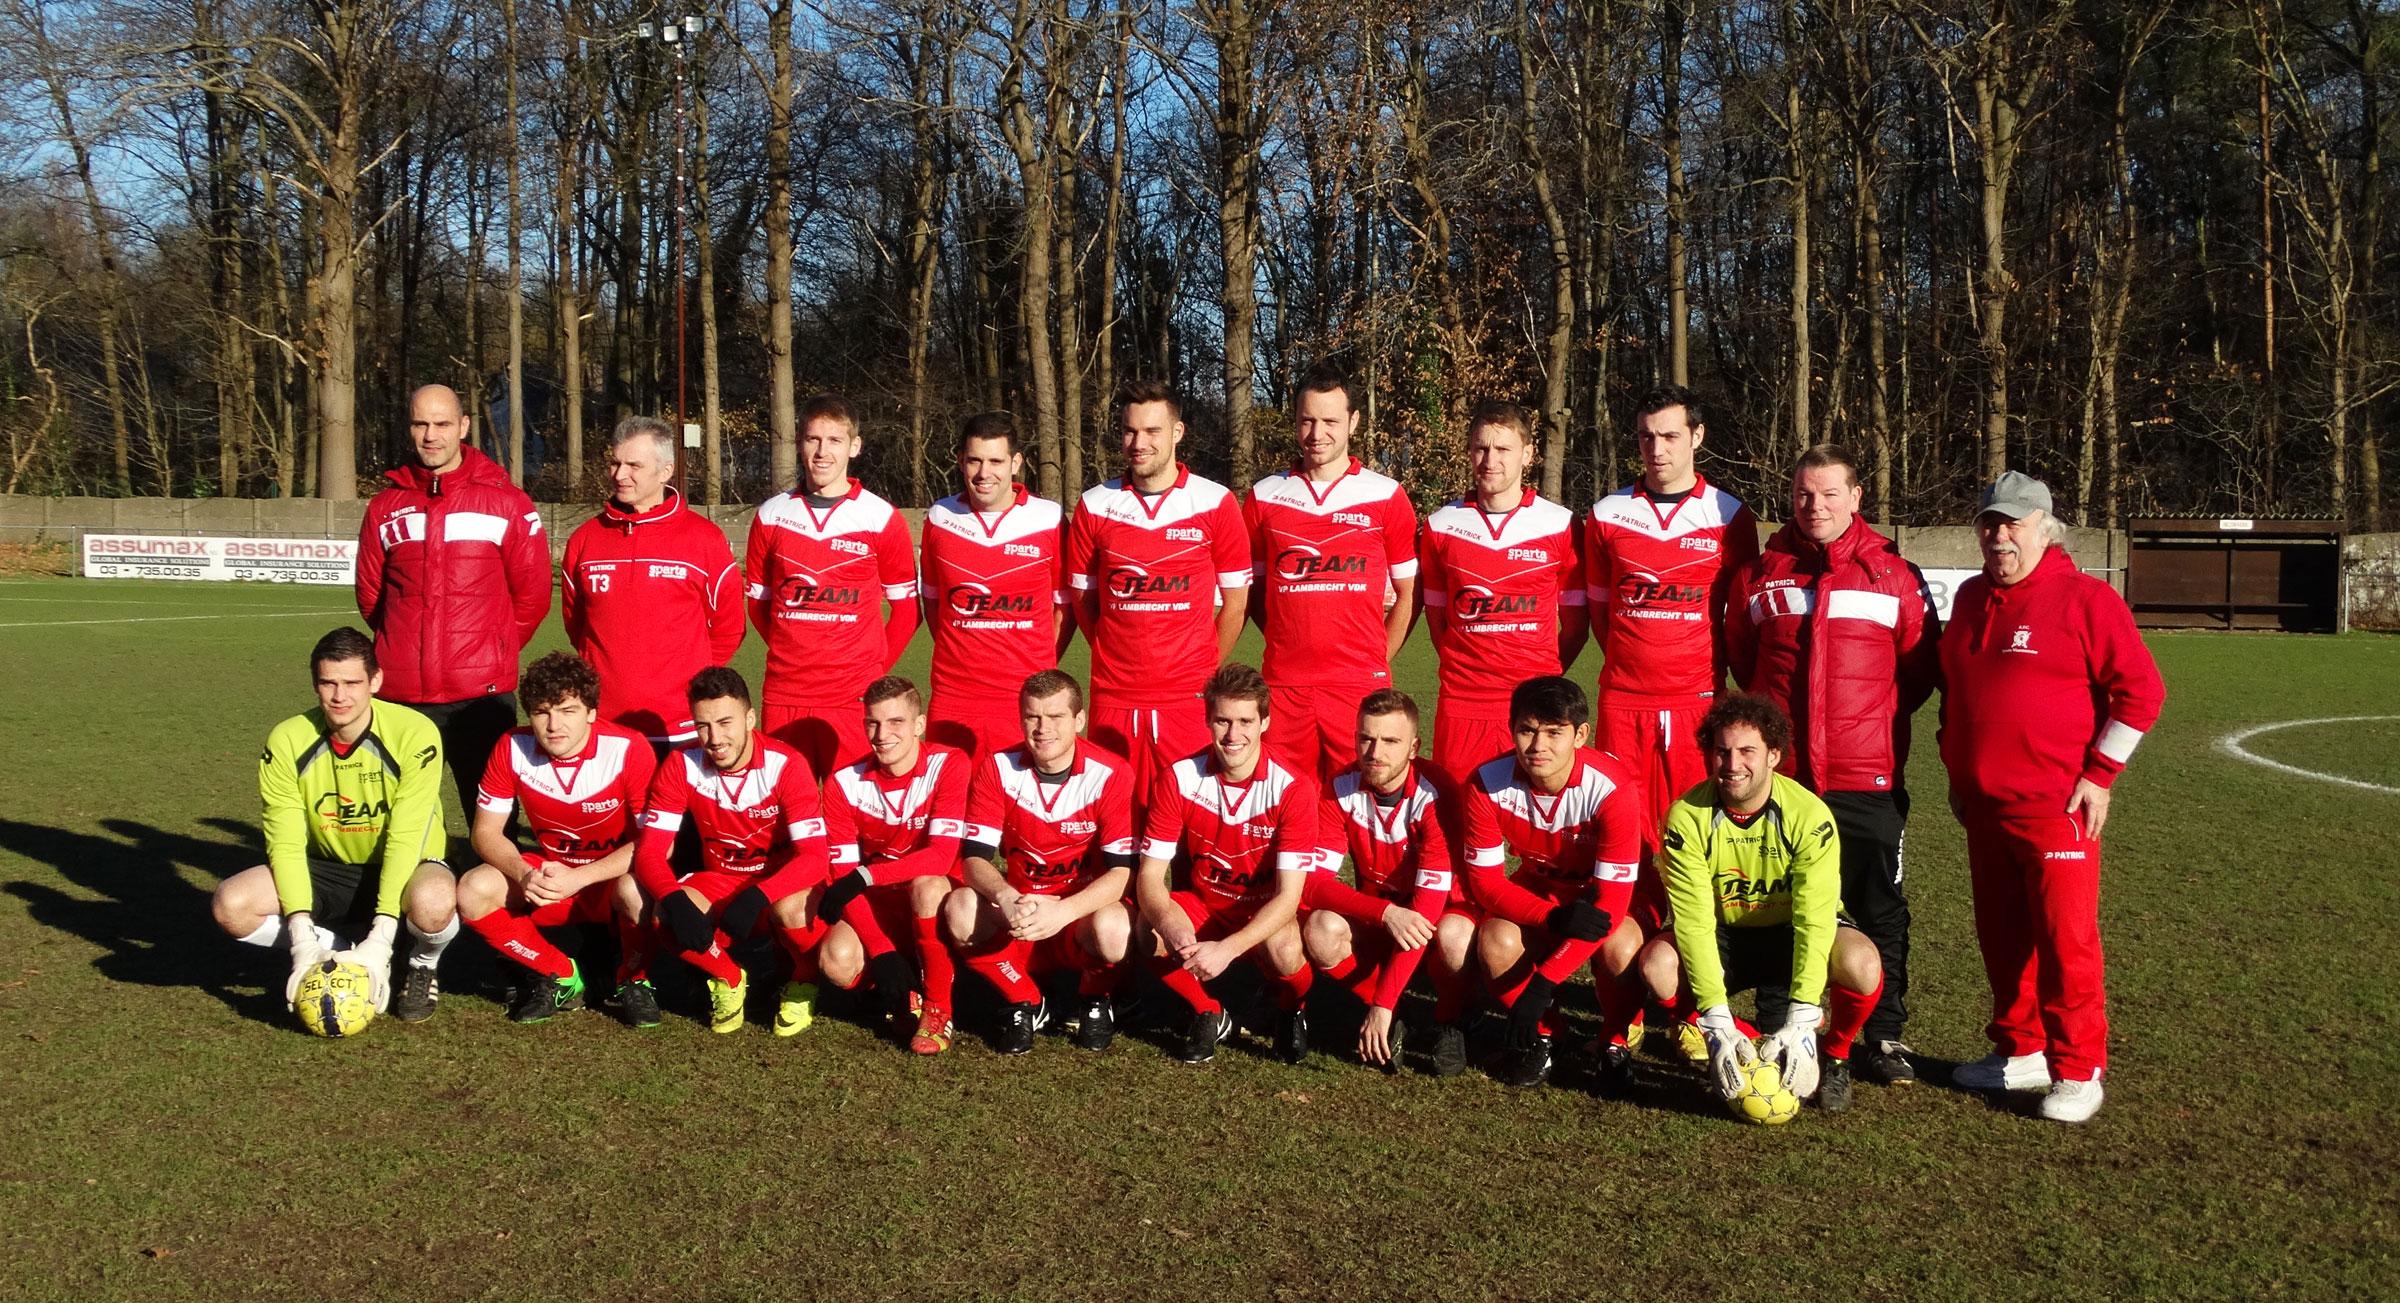 eeste-ploeg-2016-2017